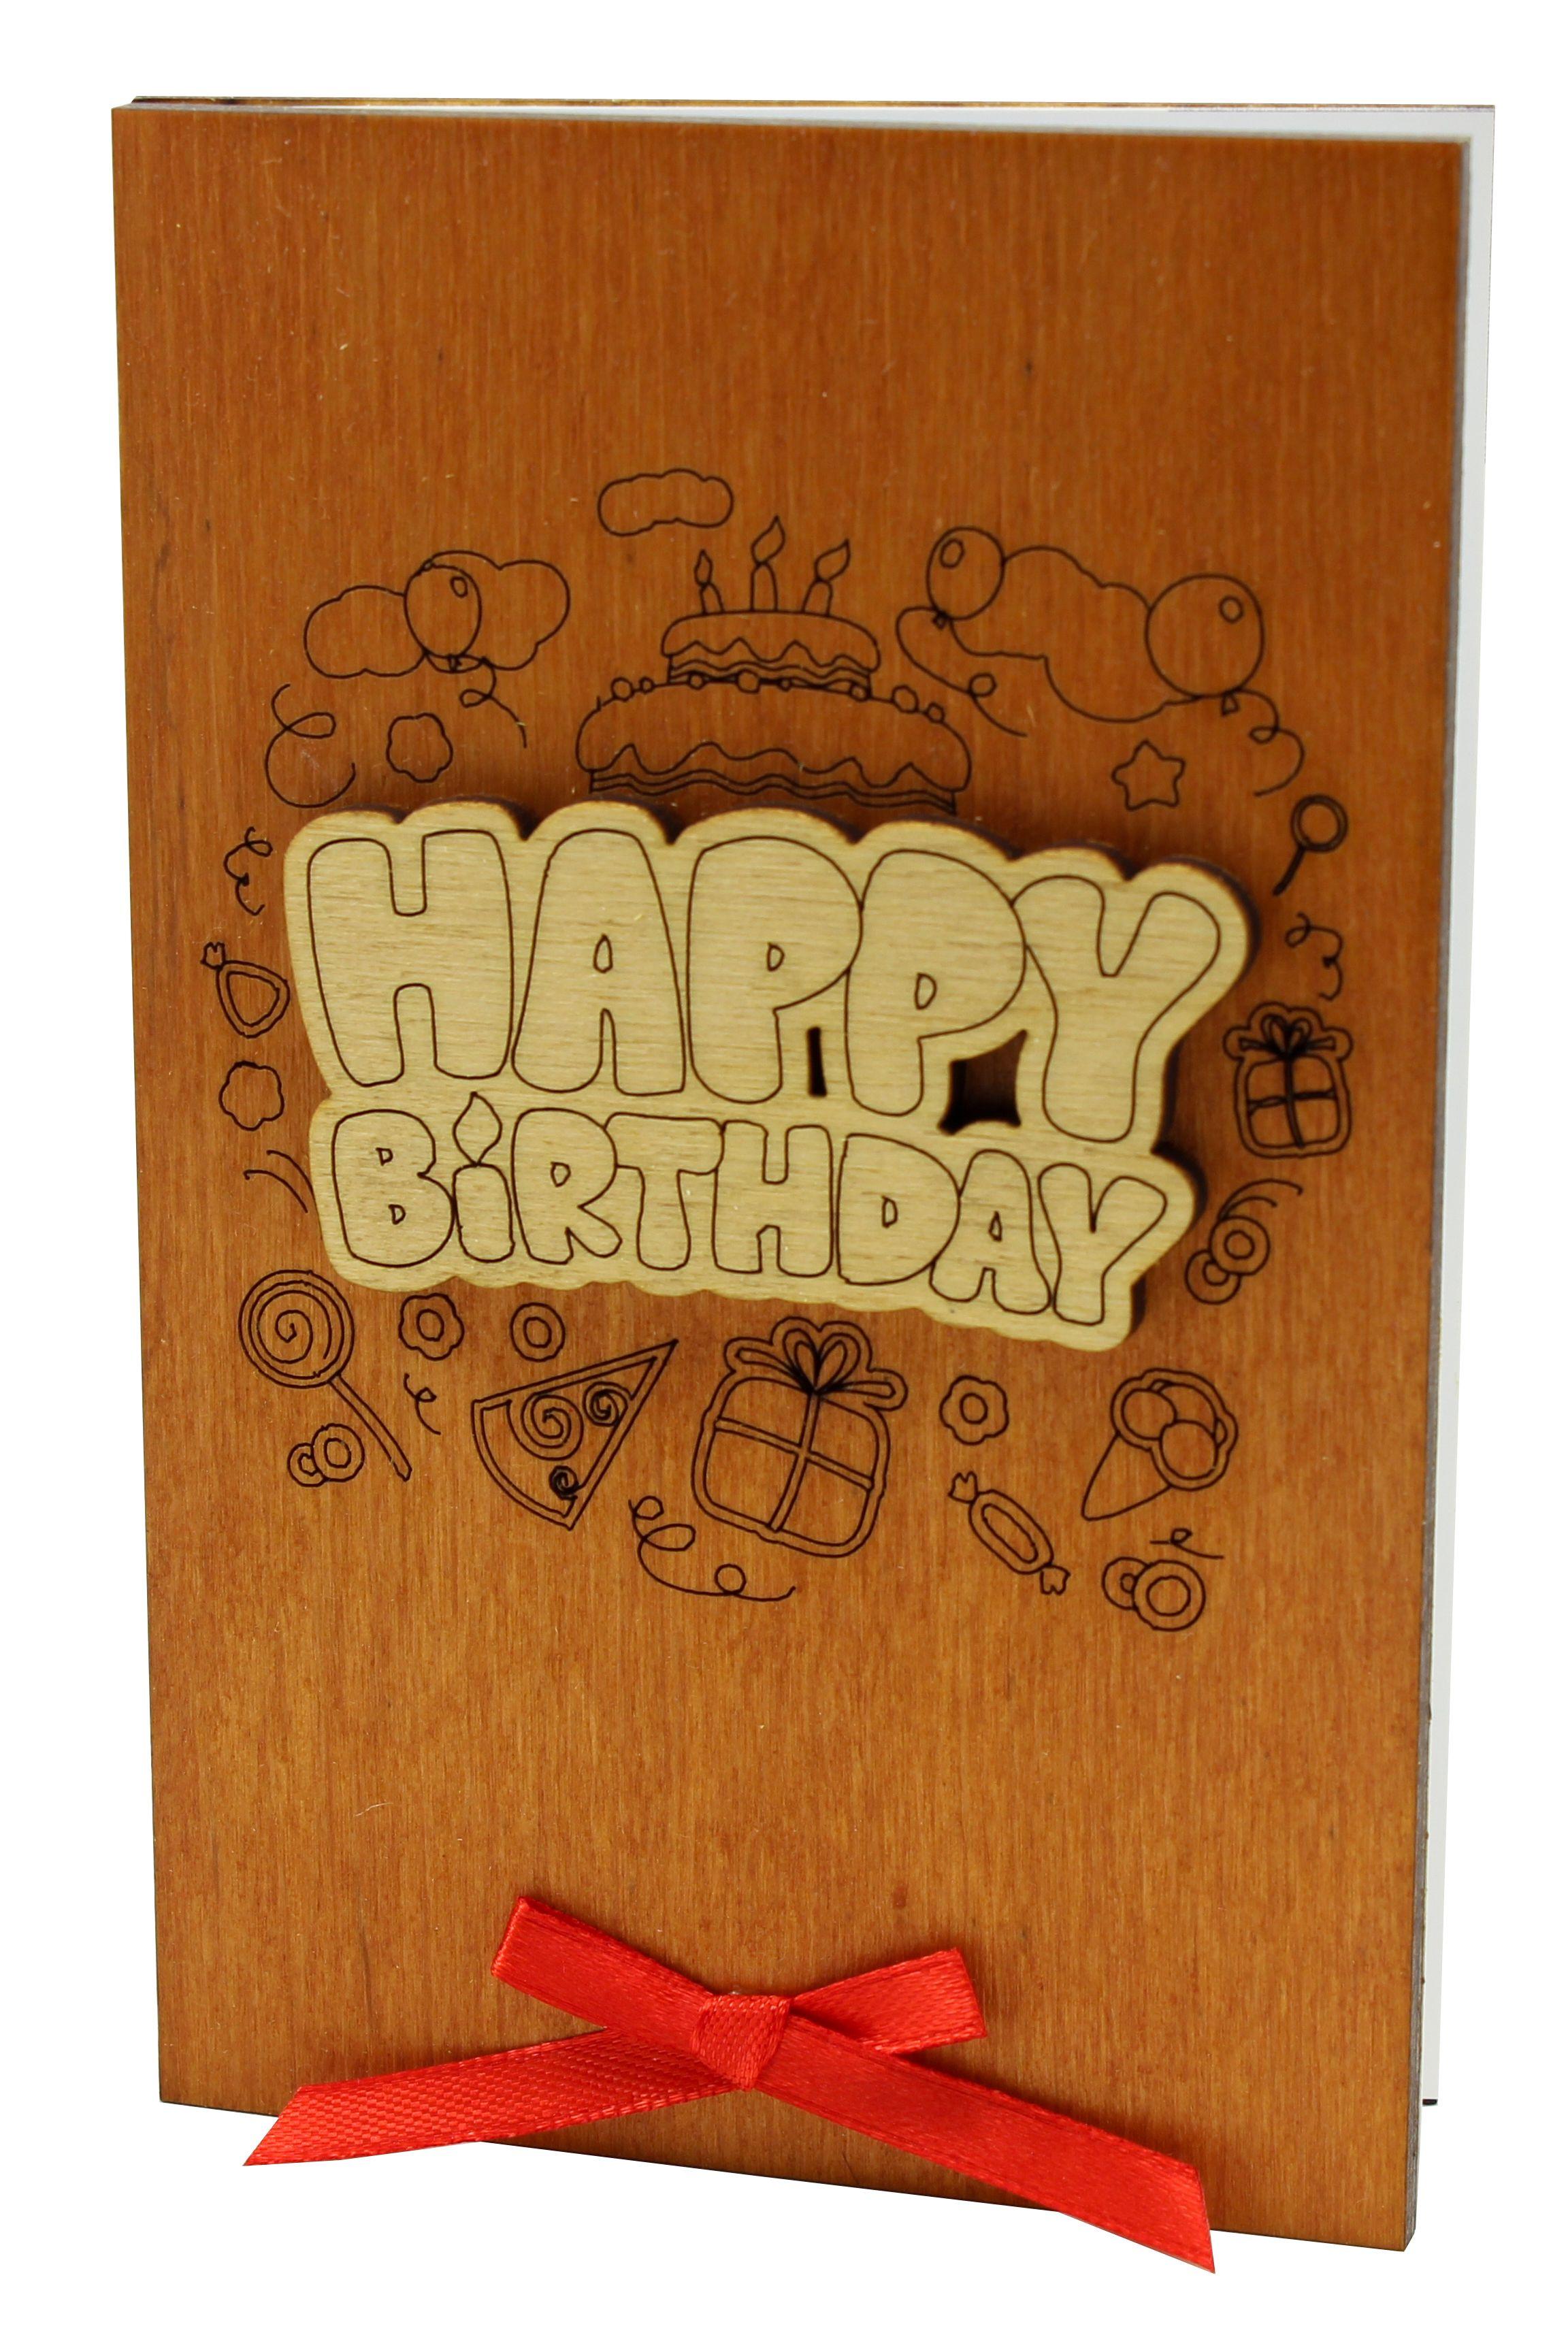 Happy birthday card birthday gifts funny birthday cards wood happy birthday card birthday gifts funny birthday cards wood work birthday cards bookmarktalkfo Choice Image